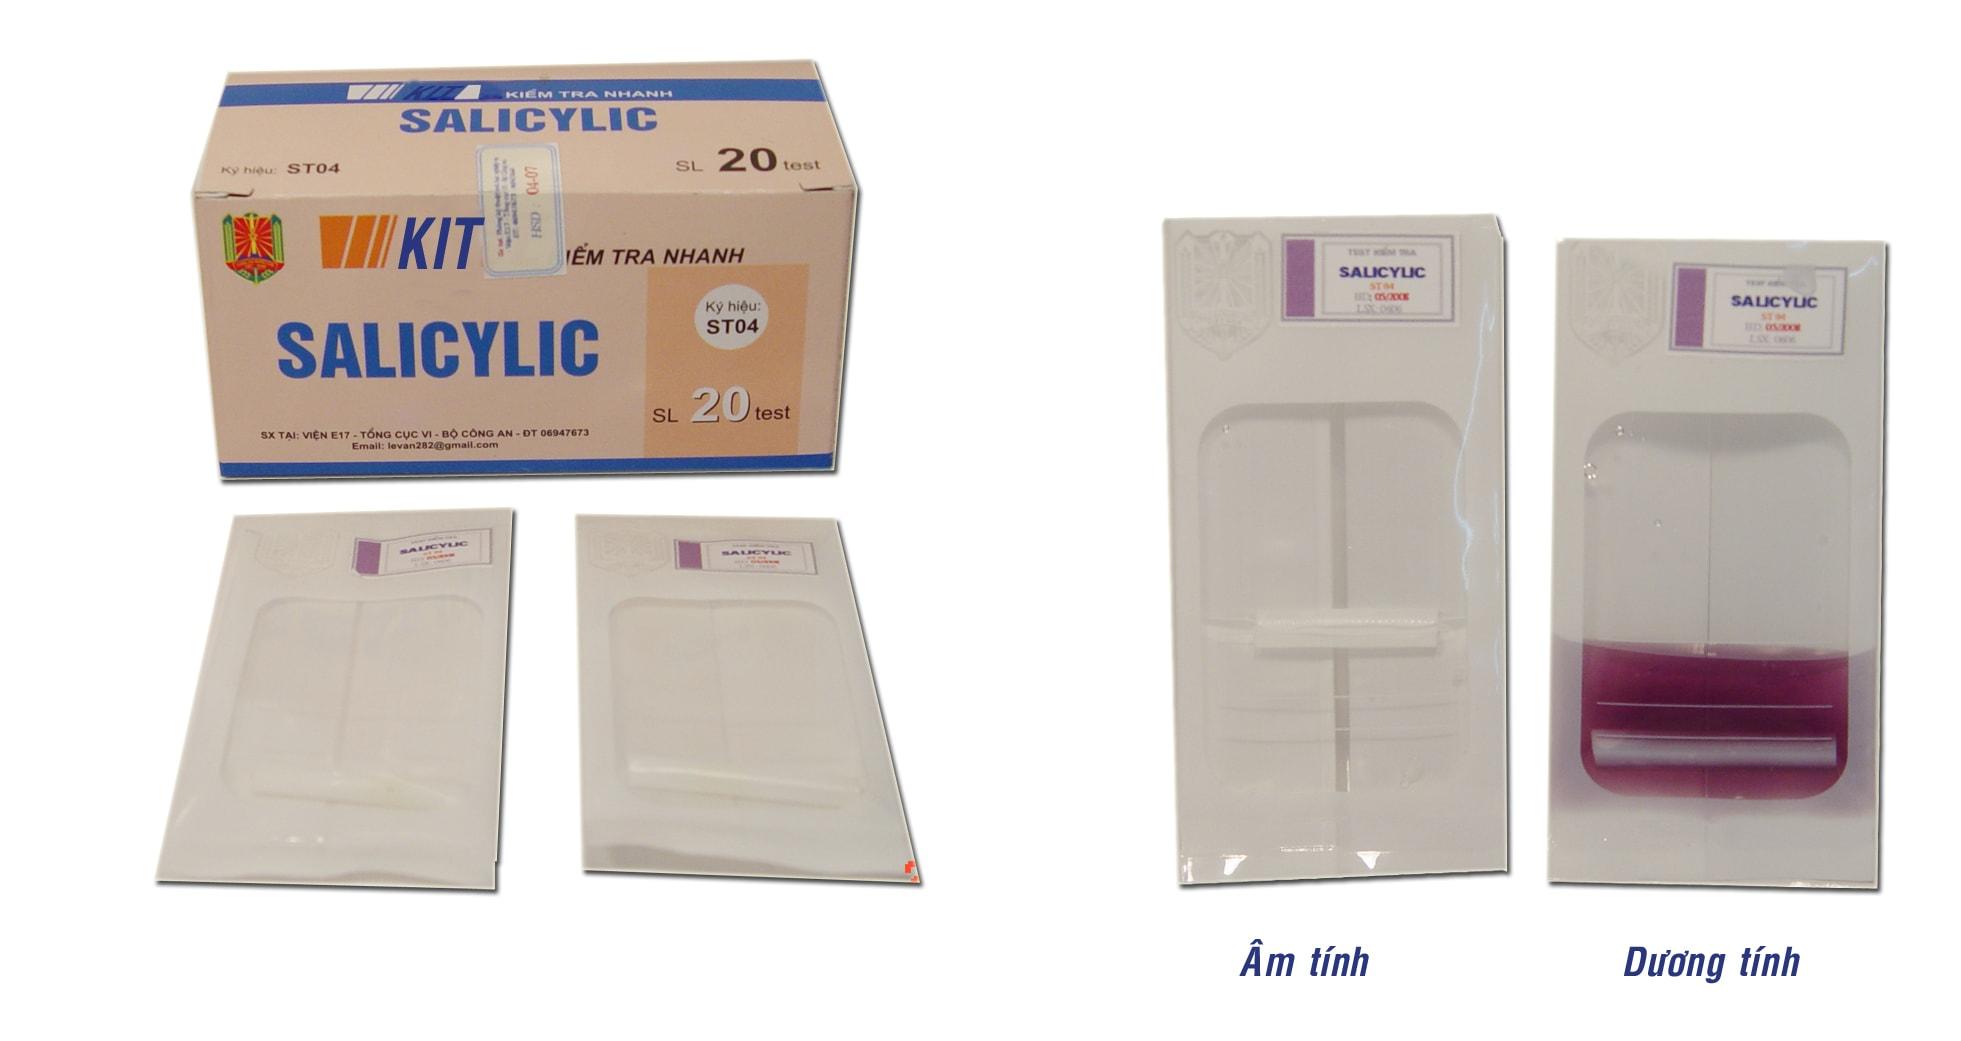 KIT kiểm tra nhanh salicylic ST04 VietnamMaterials